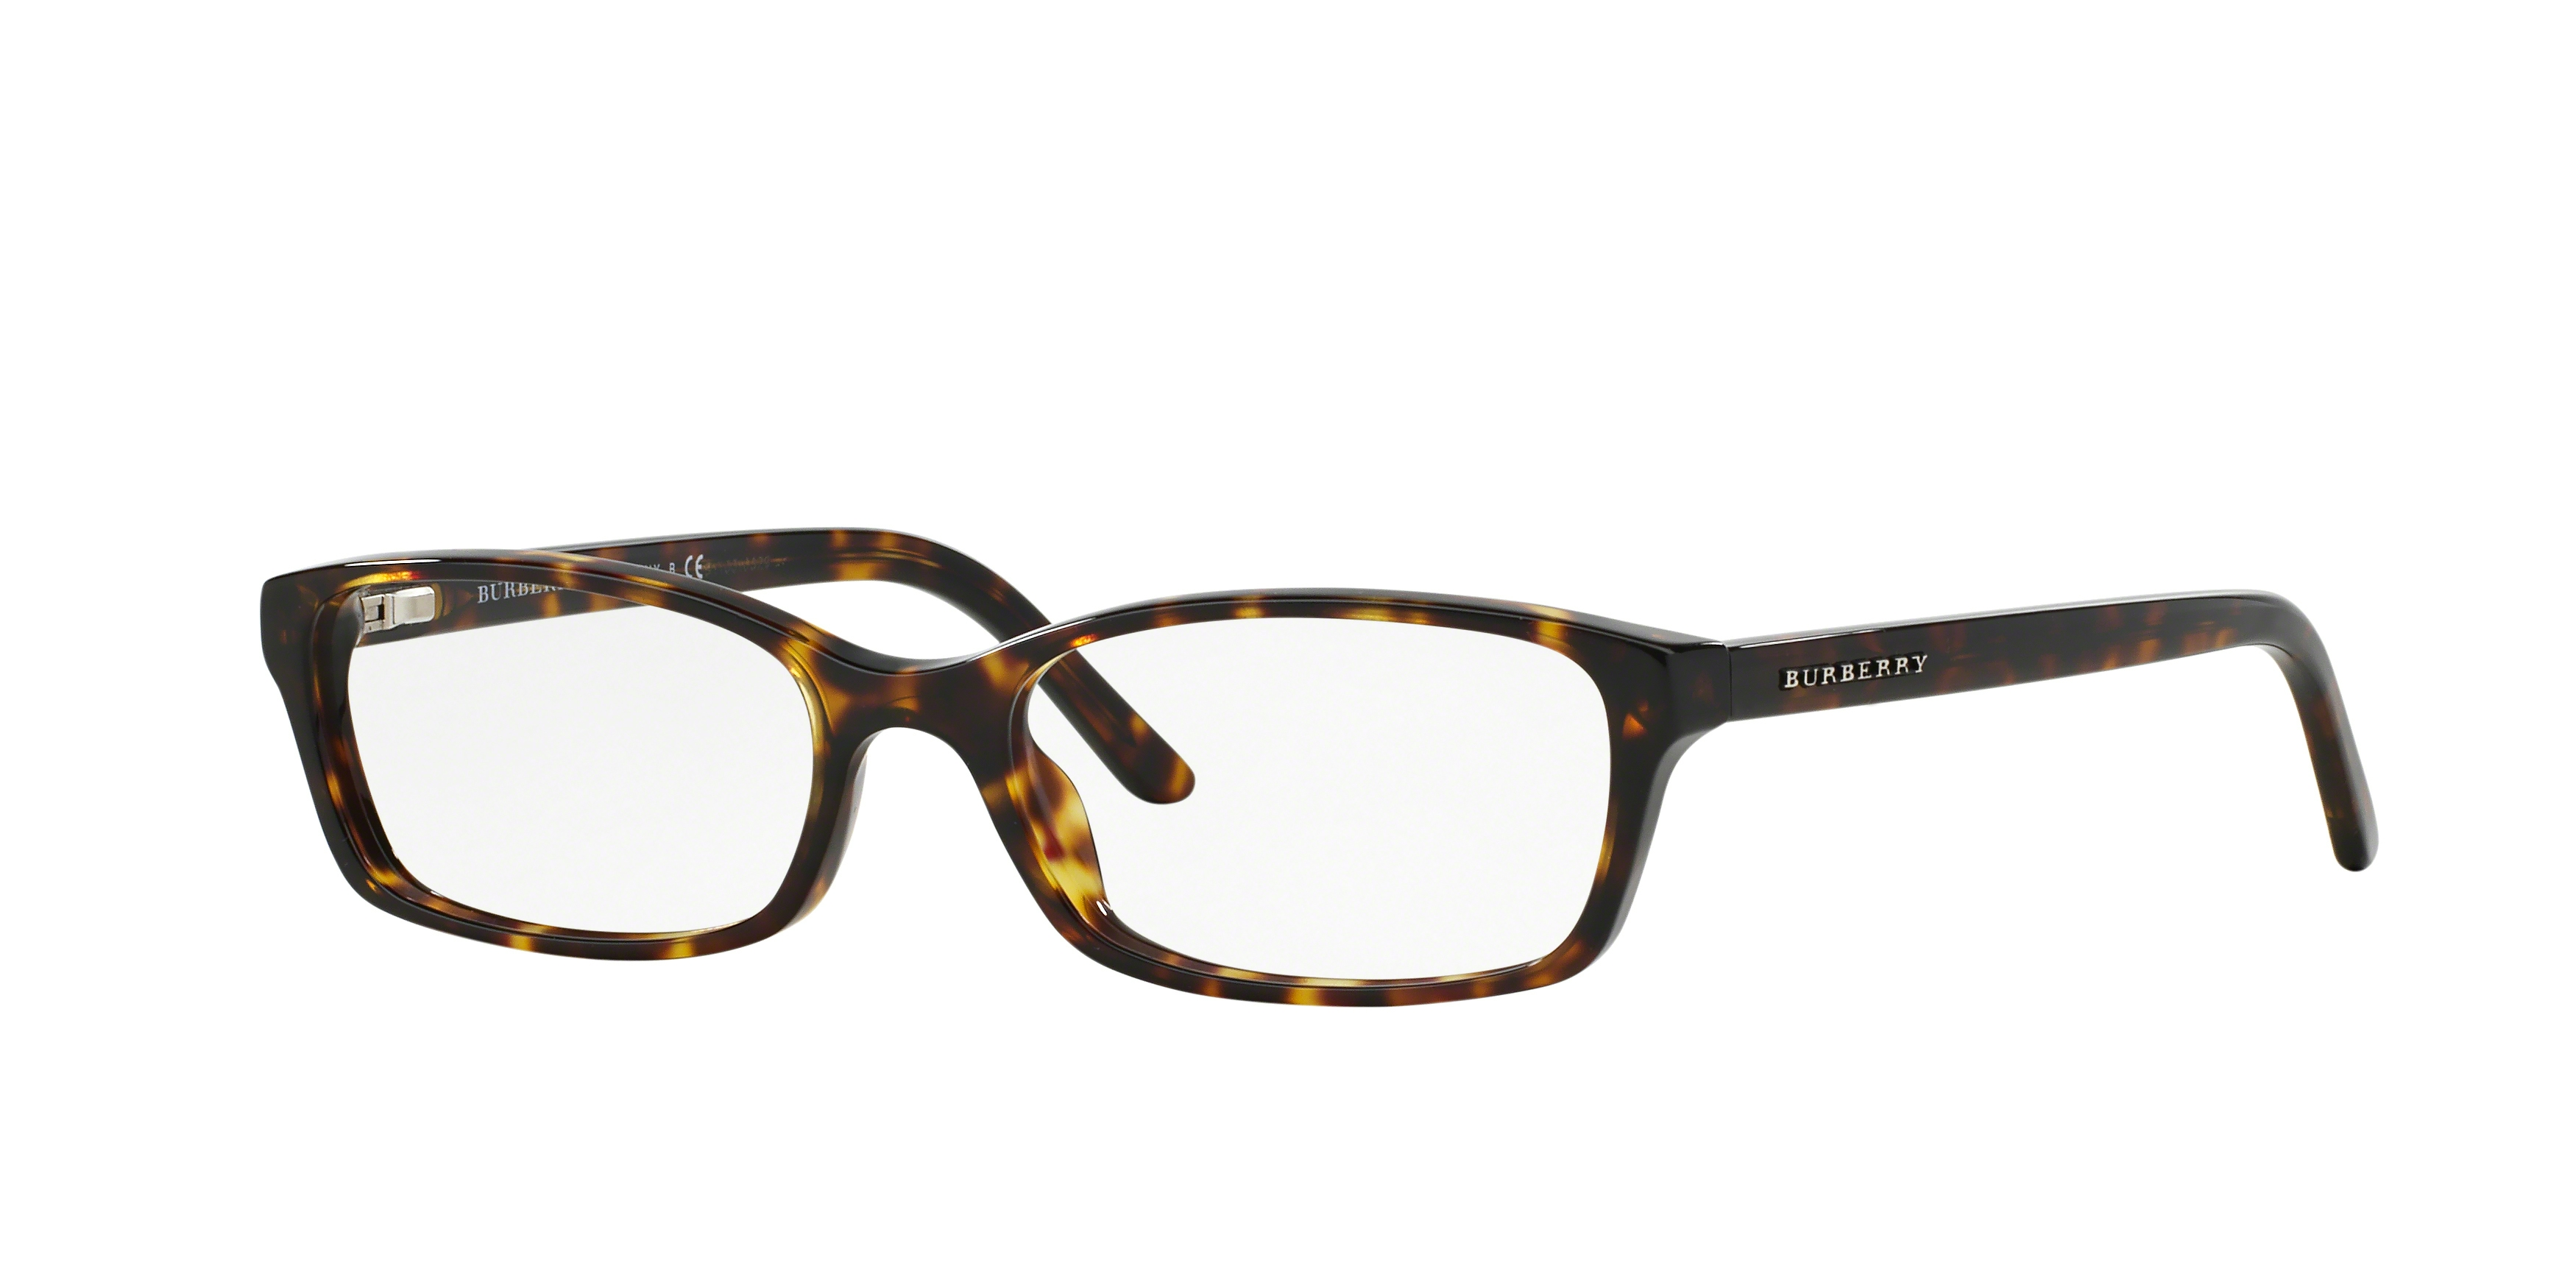 8892b2bc4ef7 Burberry Eyeglass Frames Be2073 Free S H 3002 53 3164